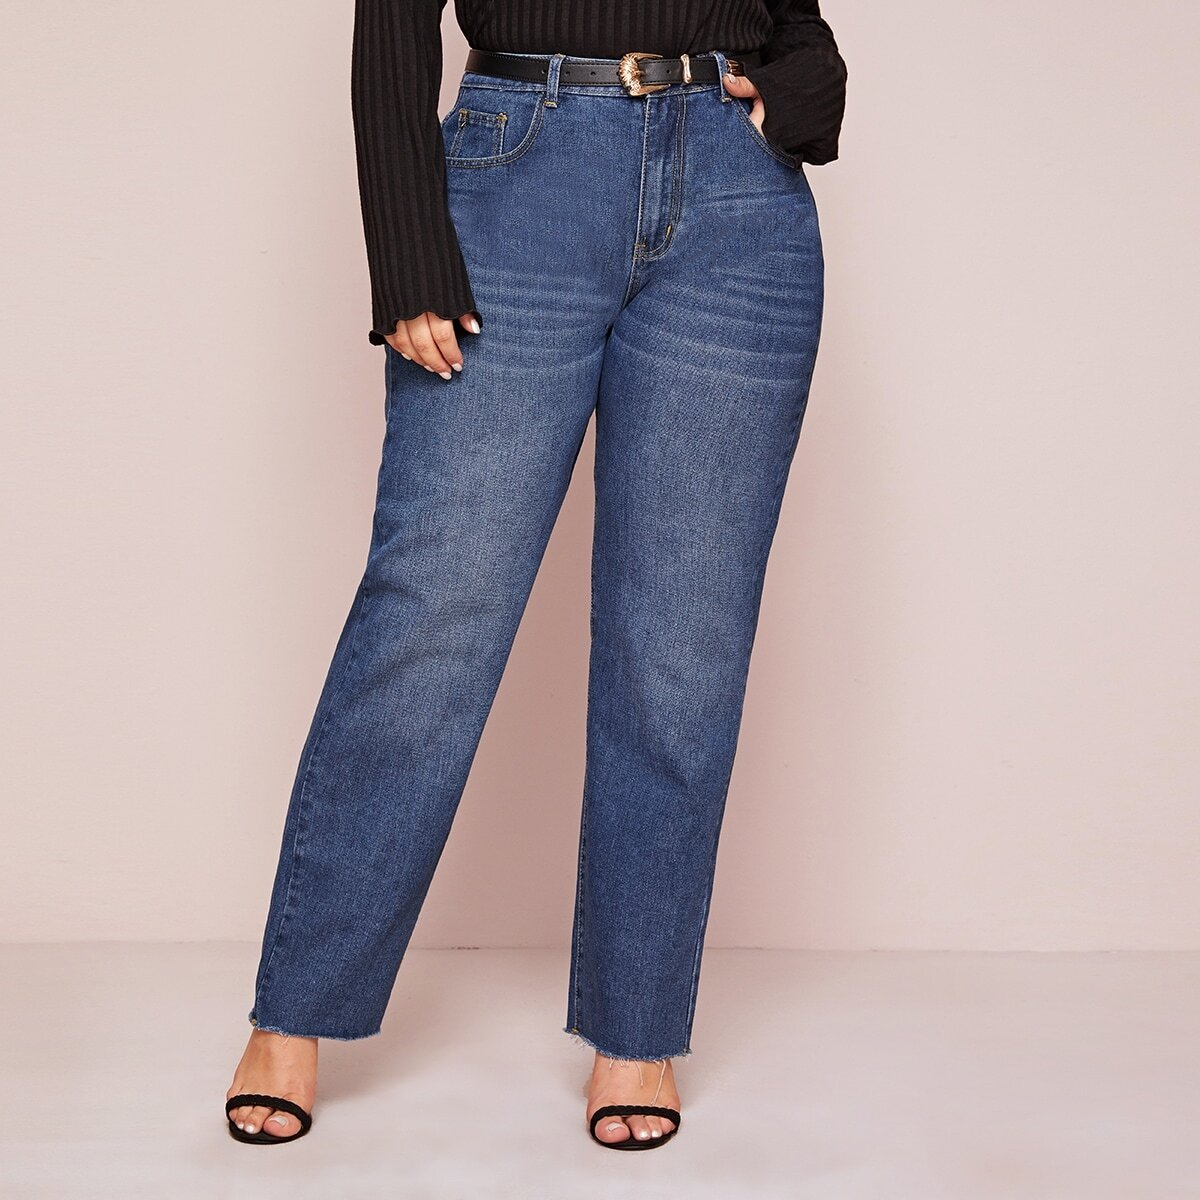 Blauw Casual Vlak Grote maten: jeans Ruwe hem